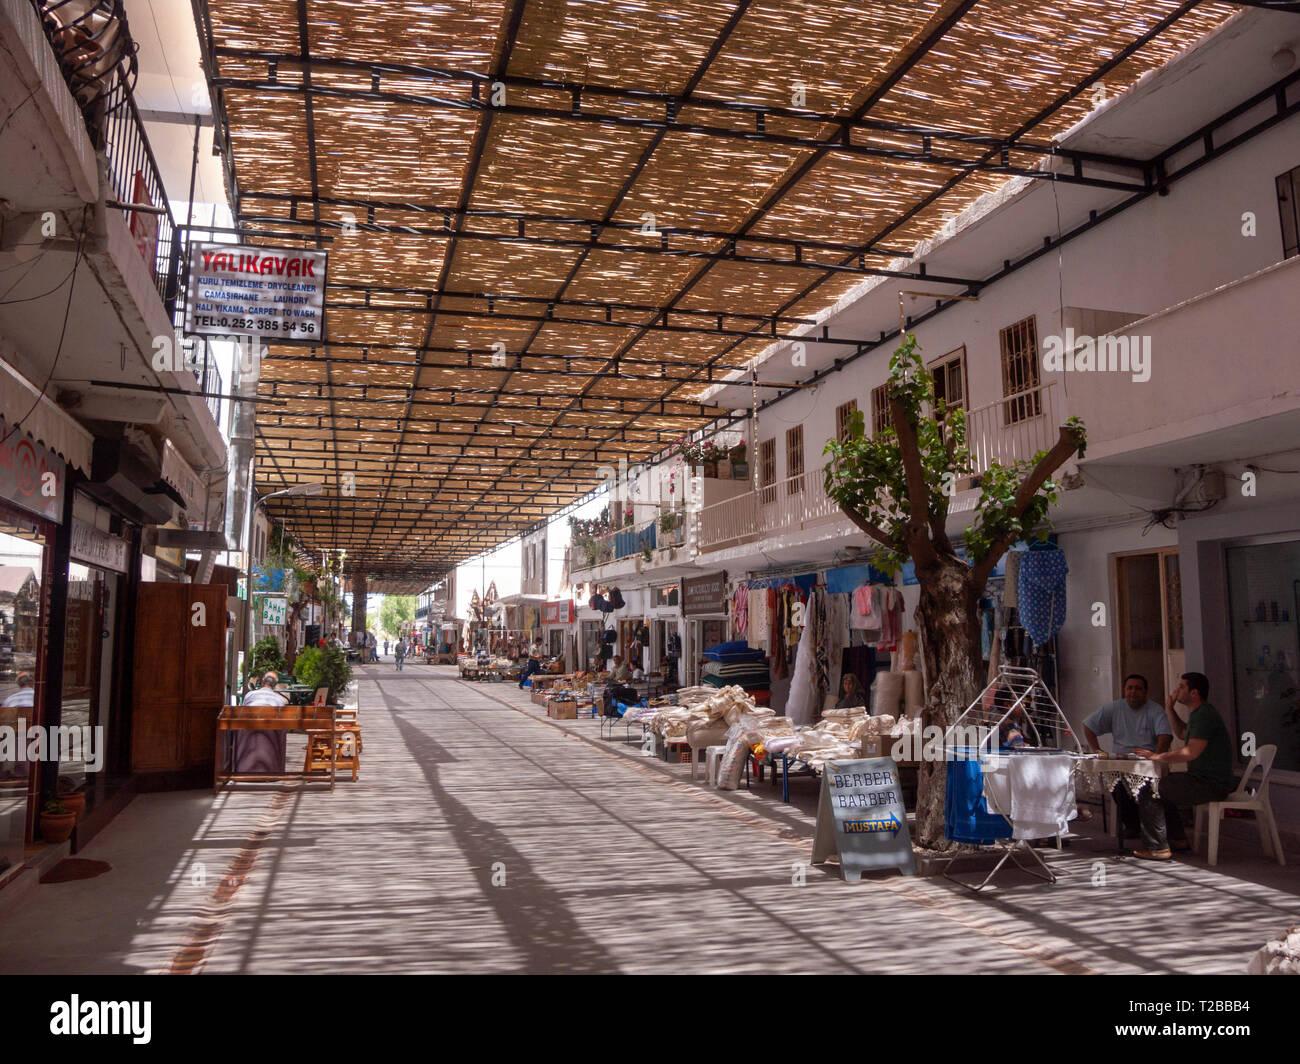 Turkey Bodrum Peninsula Mugle Province Bamboo Sunshade Roofing Covers The Main Street Of Yalikavak Stock Photo Alamy